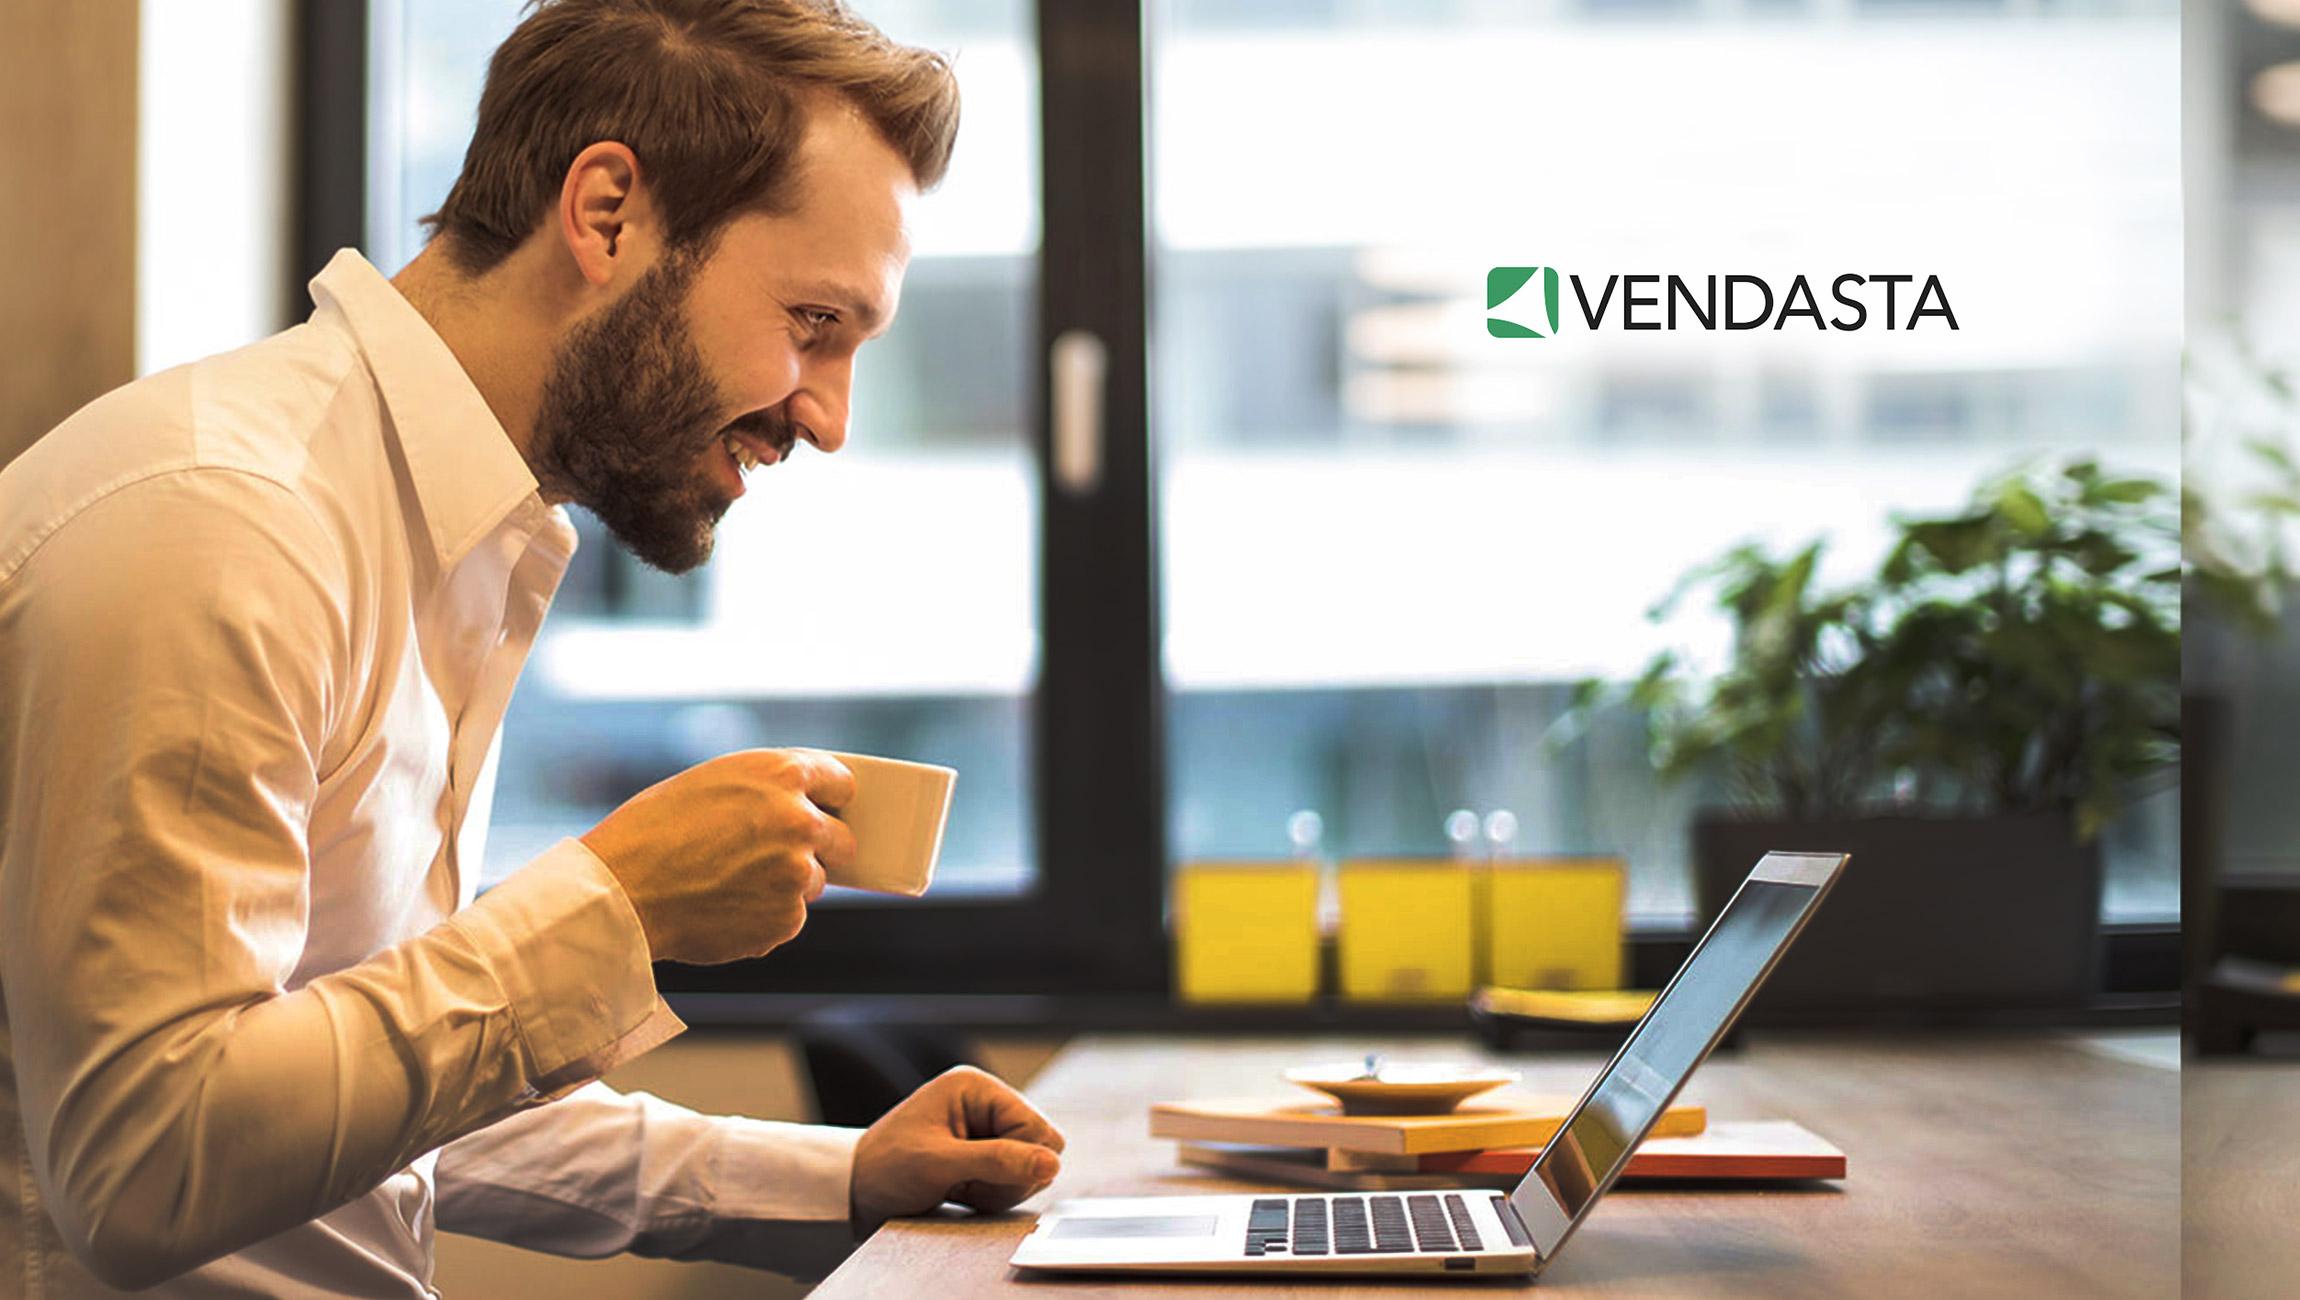 Vendasta Among Deloitte Technology Fast 500™ Companies